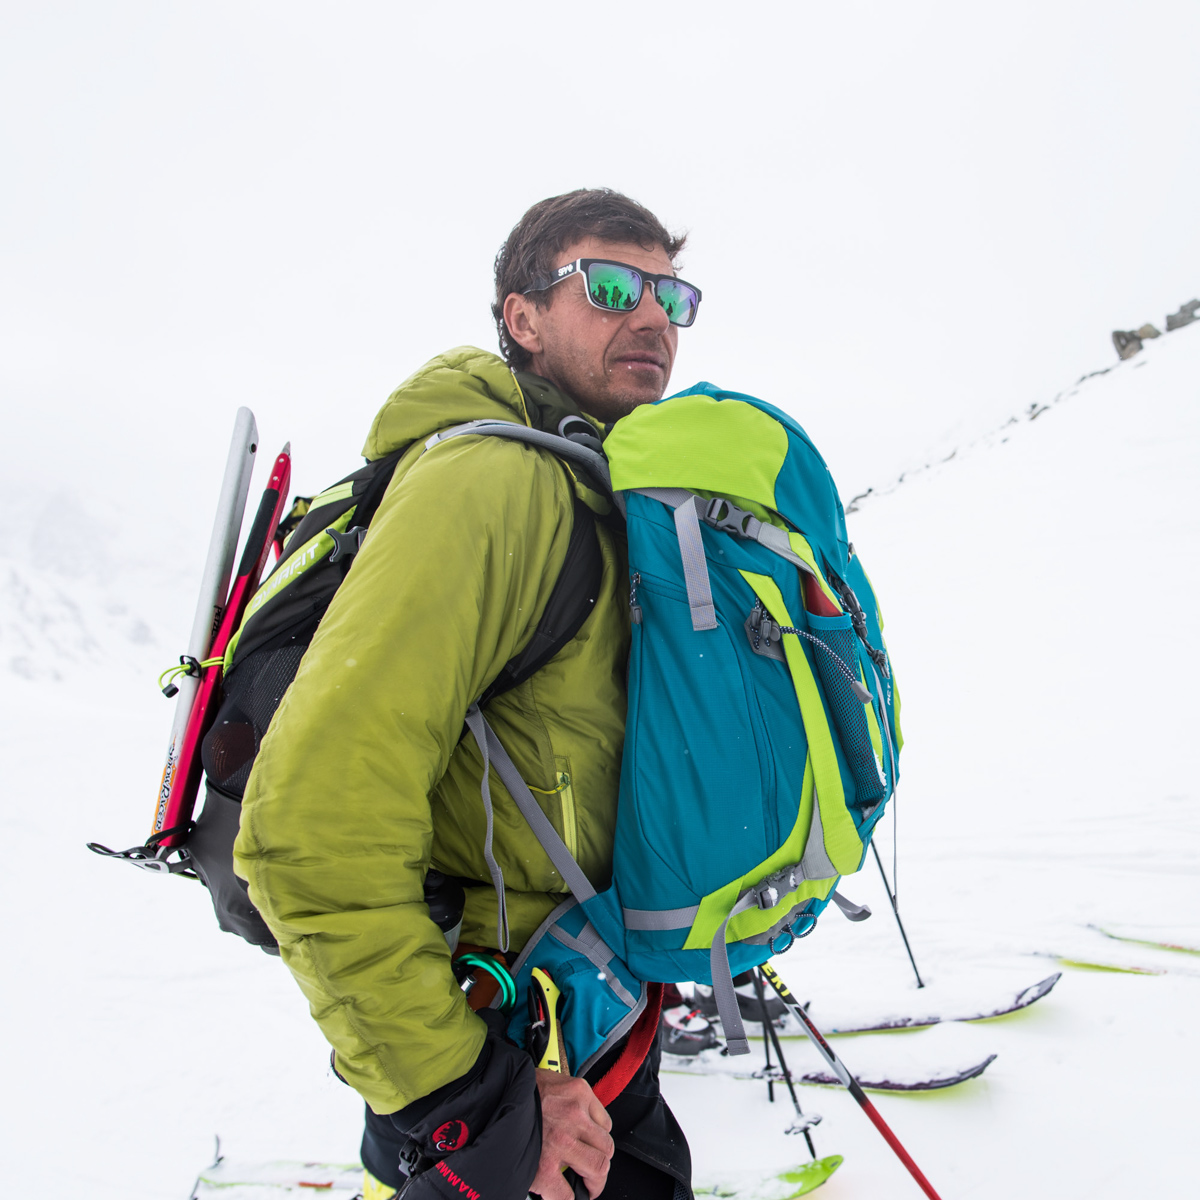 Chamonix-Zermatt-Timothee-Nalet-3543